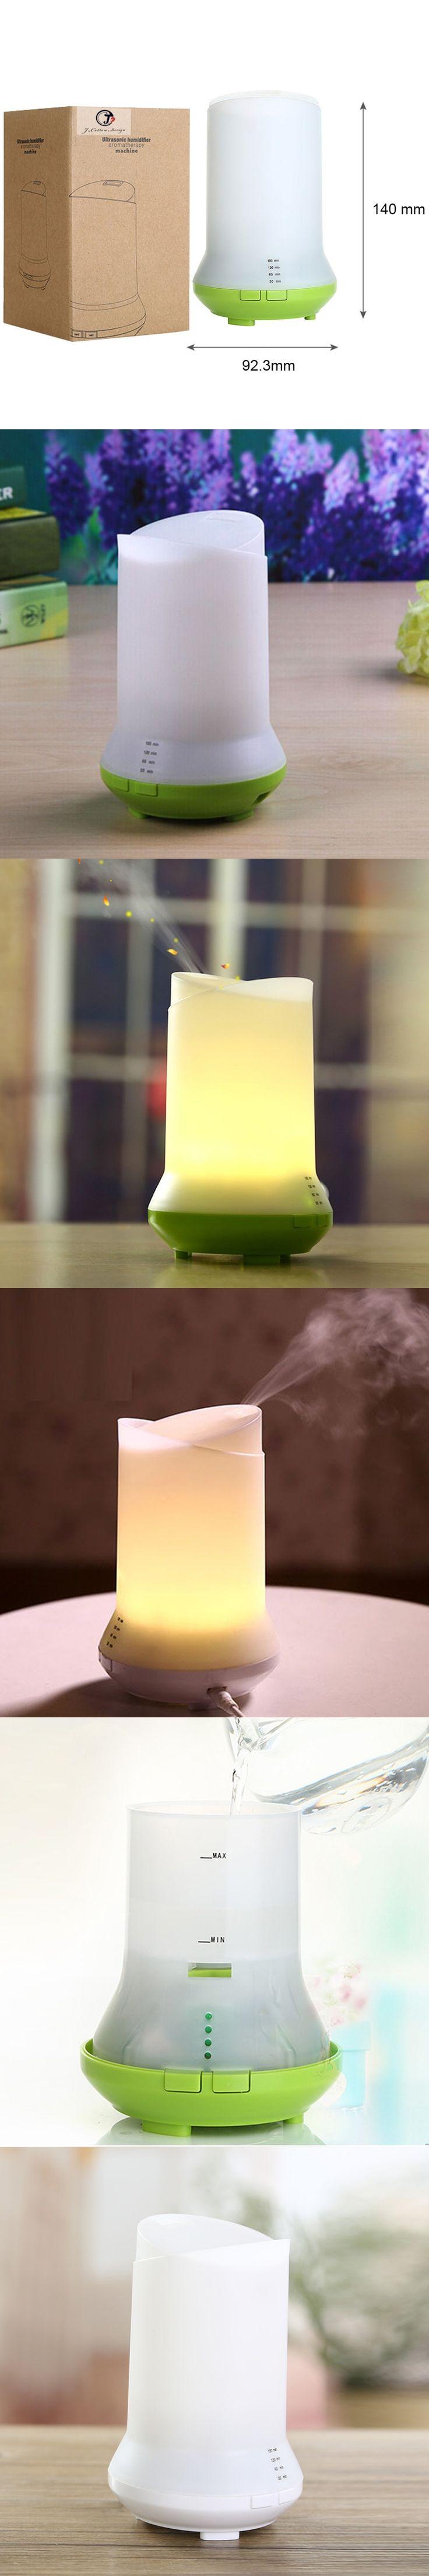 2016 Essential Oil Aroma Diffuser Ultrasonic Air Humidifier Ultrasonic Essential Oil Aroma Diffuser  Ultrasonic Aroma Humidifier